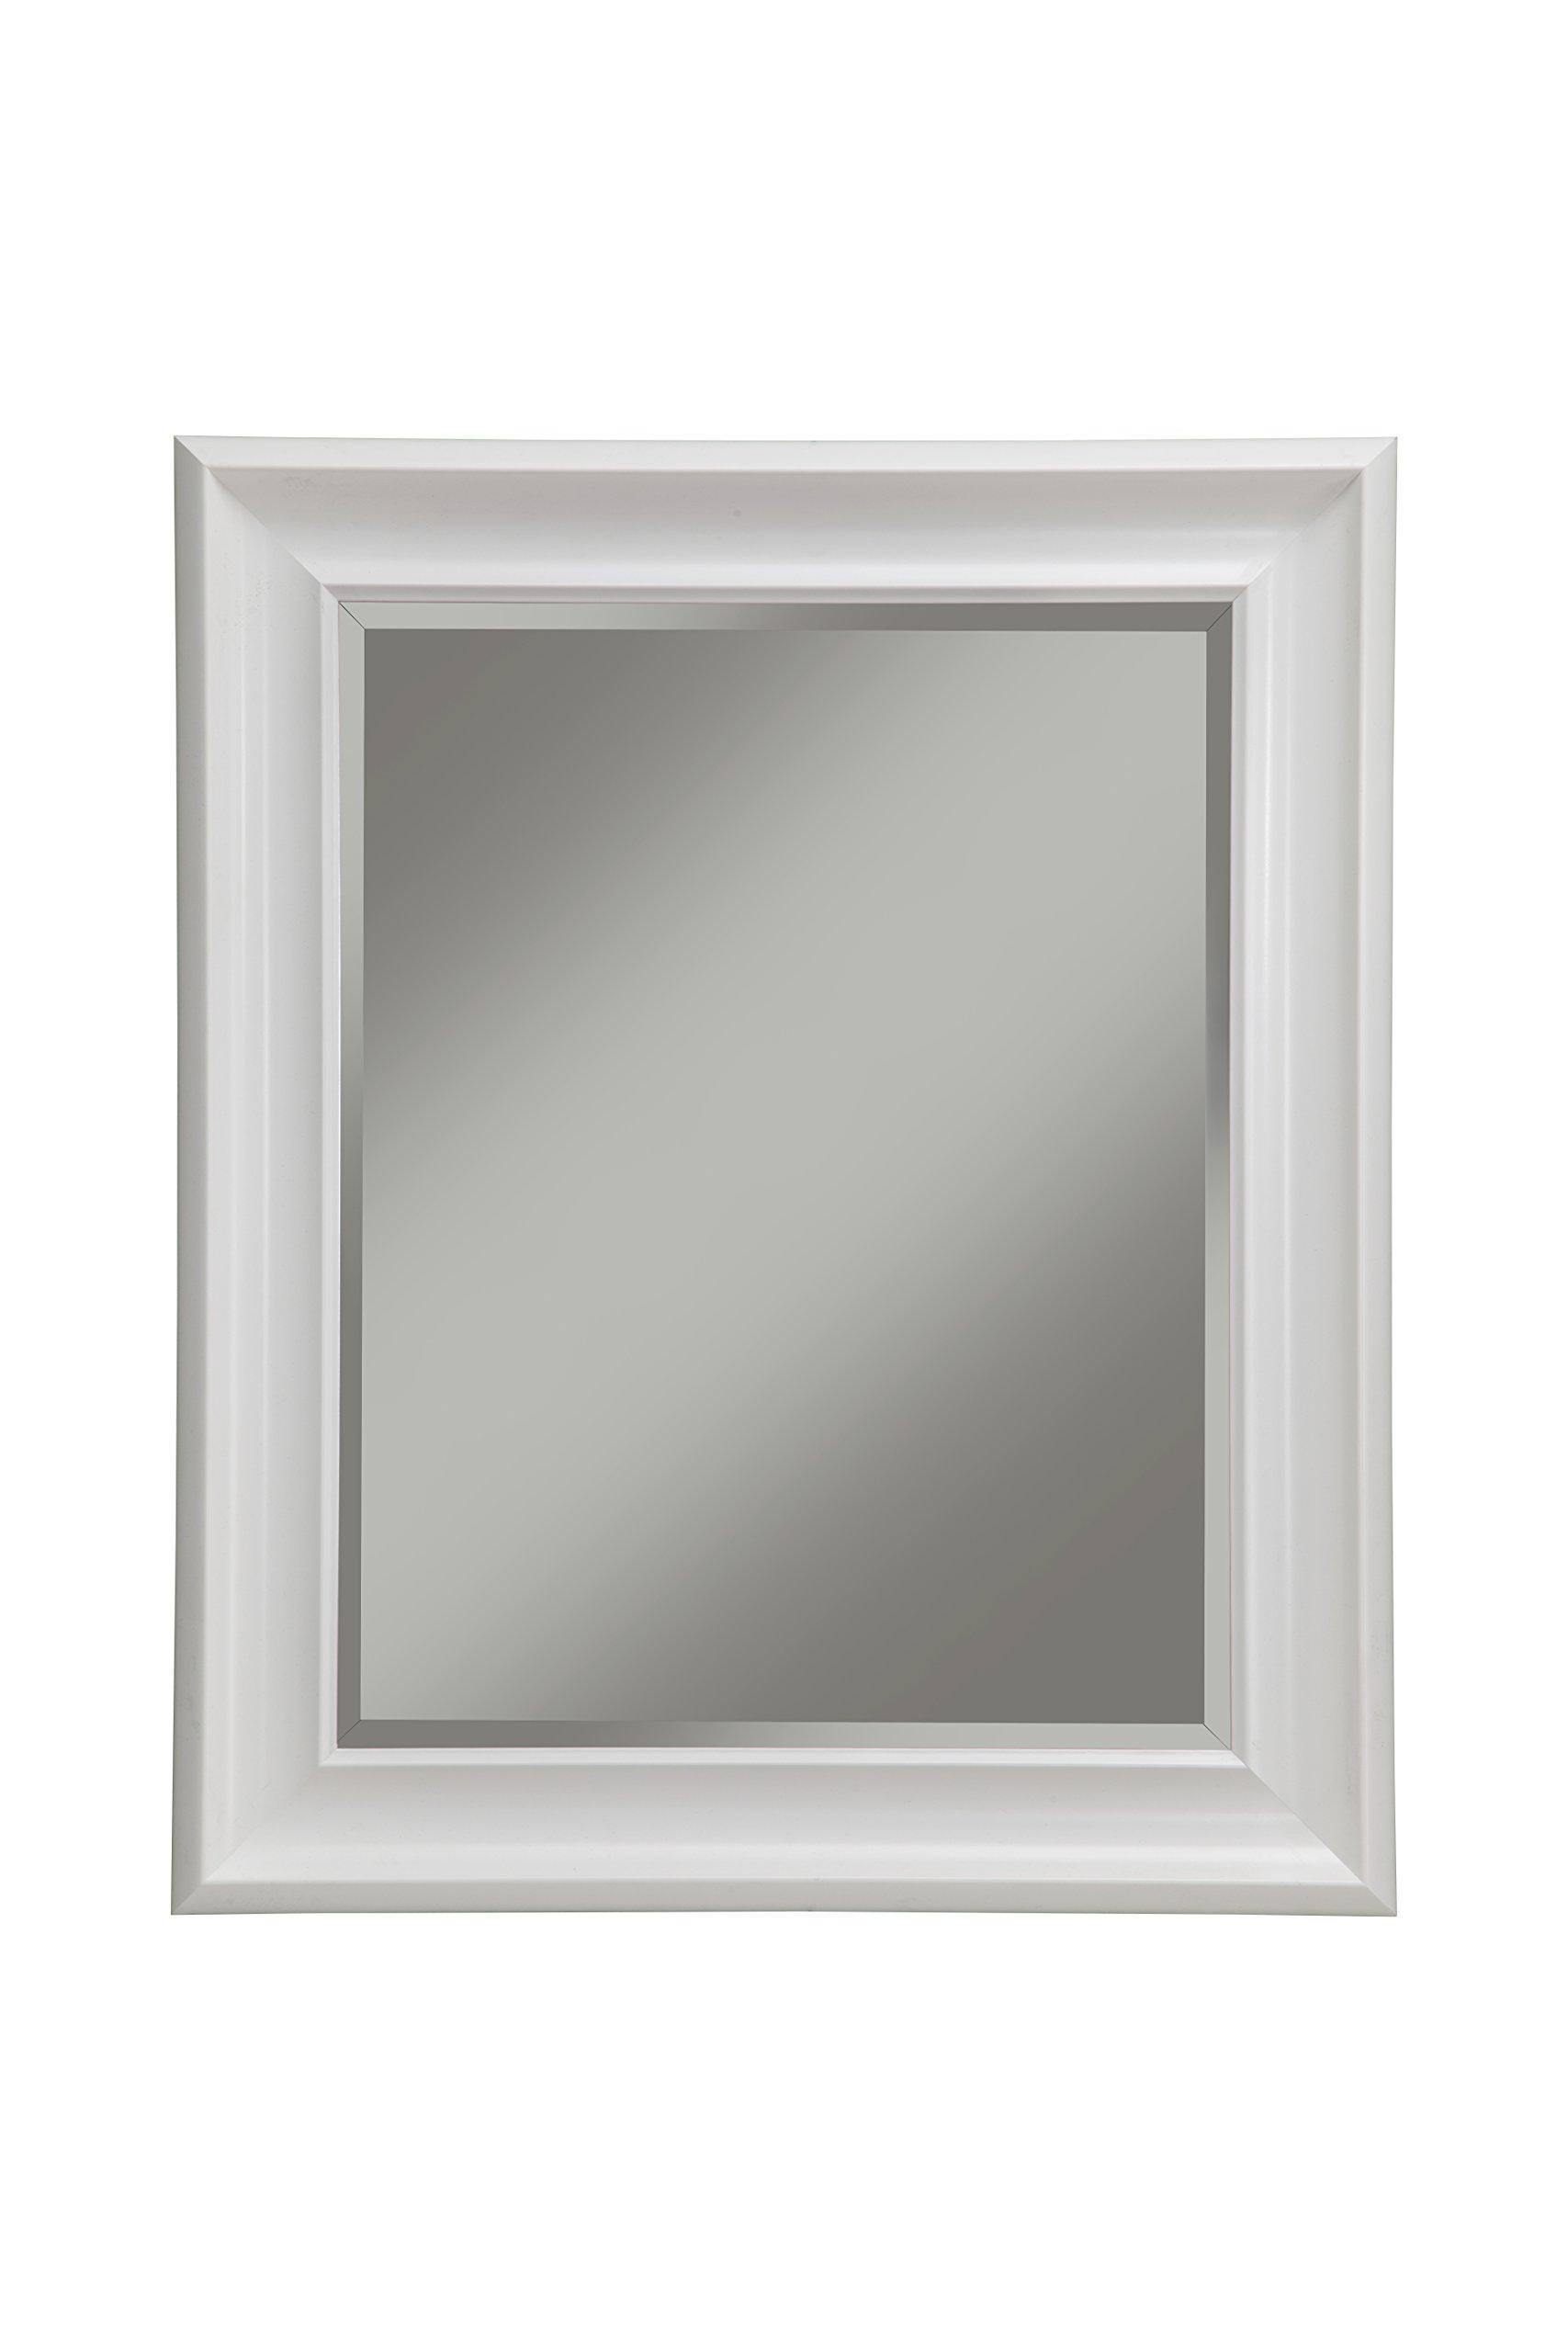 Sandberg Furniture 13017 Wall Mirror, 36'' x 30'', White